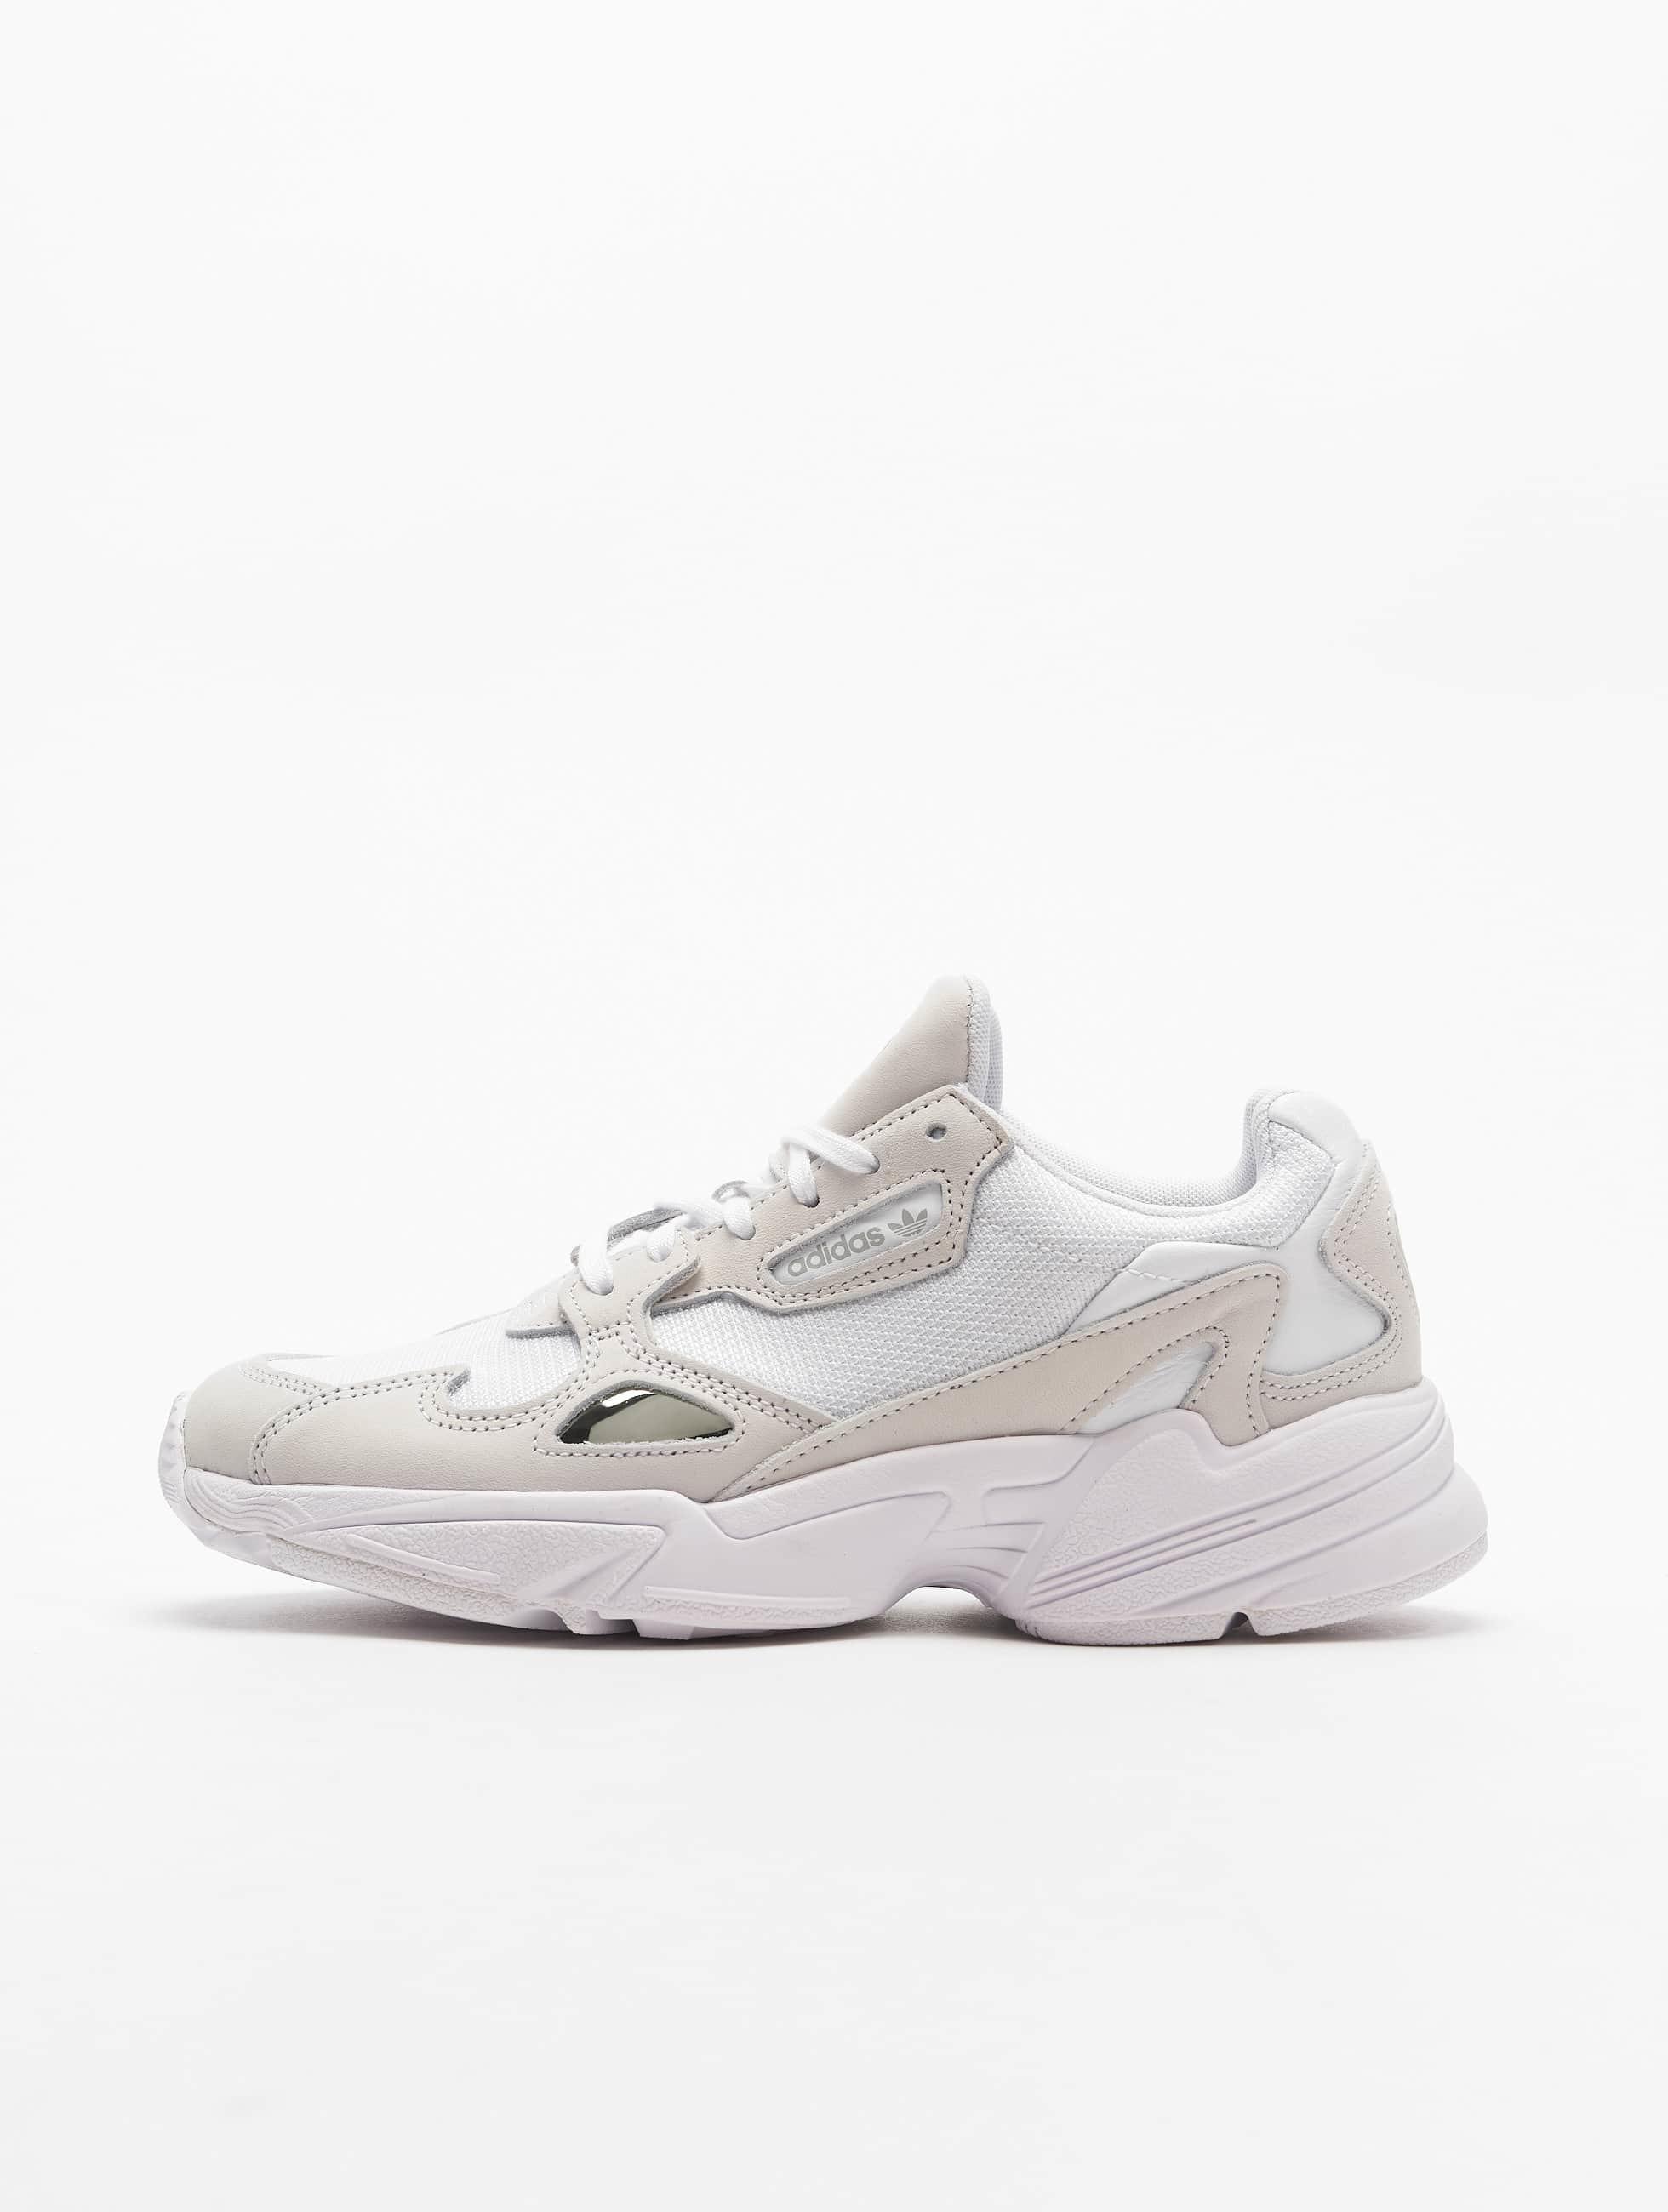 Adidas Originals Falcon W Sneakers Ftwr White